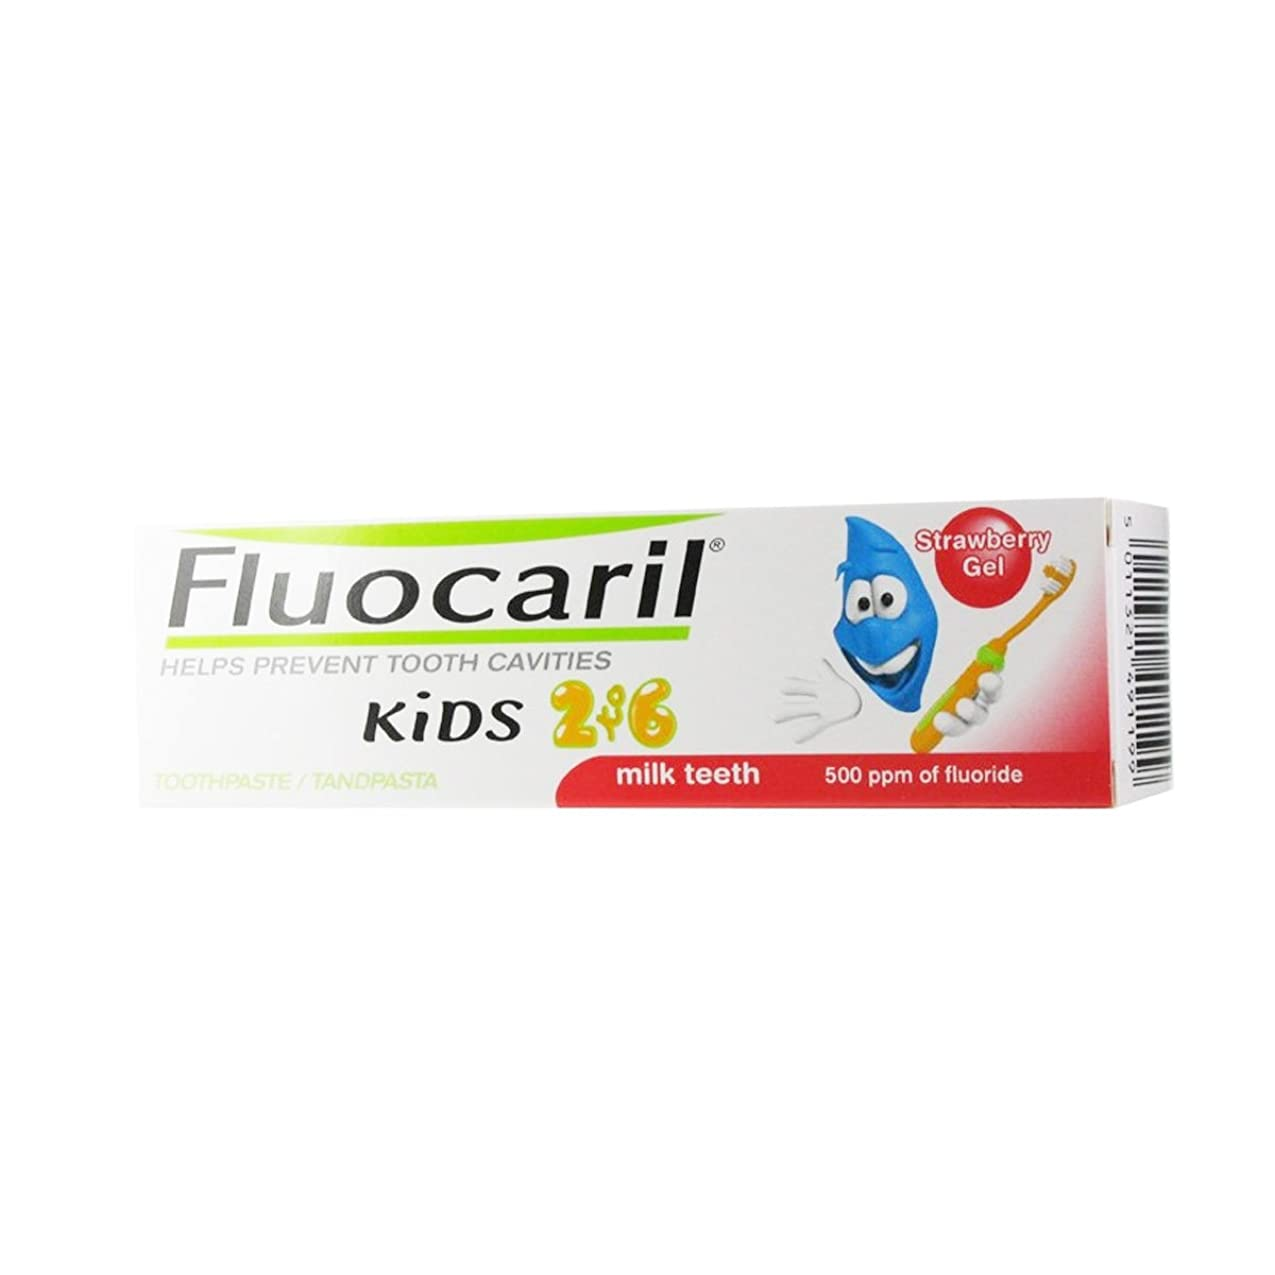 夢中会員蒸気Fluocaril Kids 2 To 6 Strawberry Gel 50ml [並行輸入品]